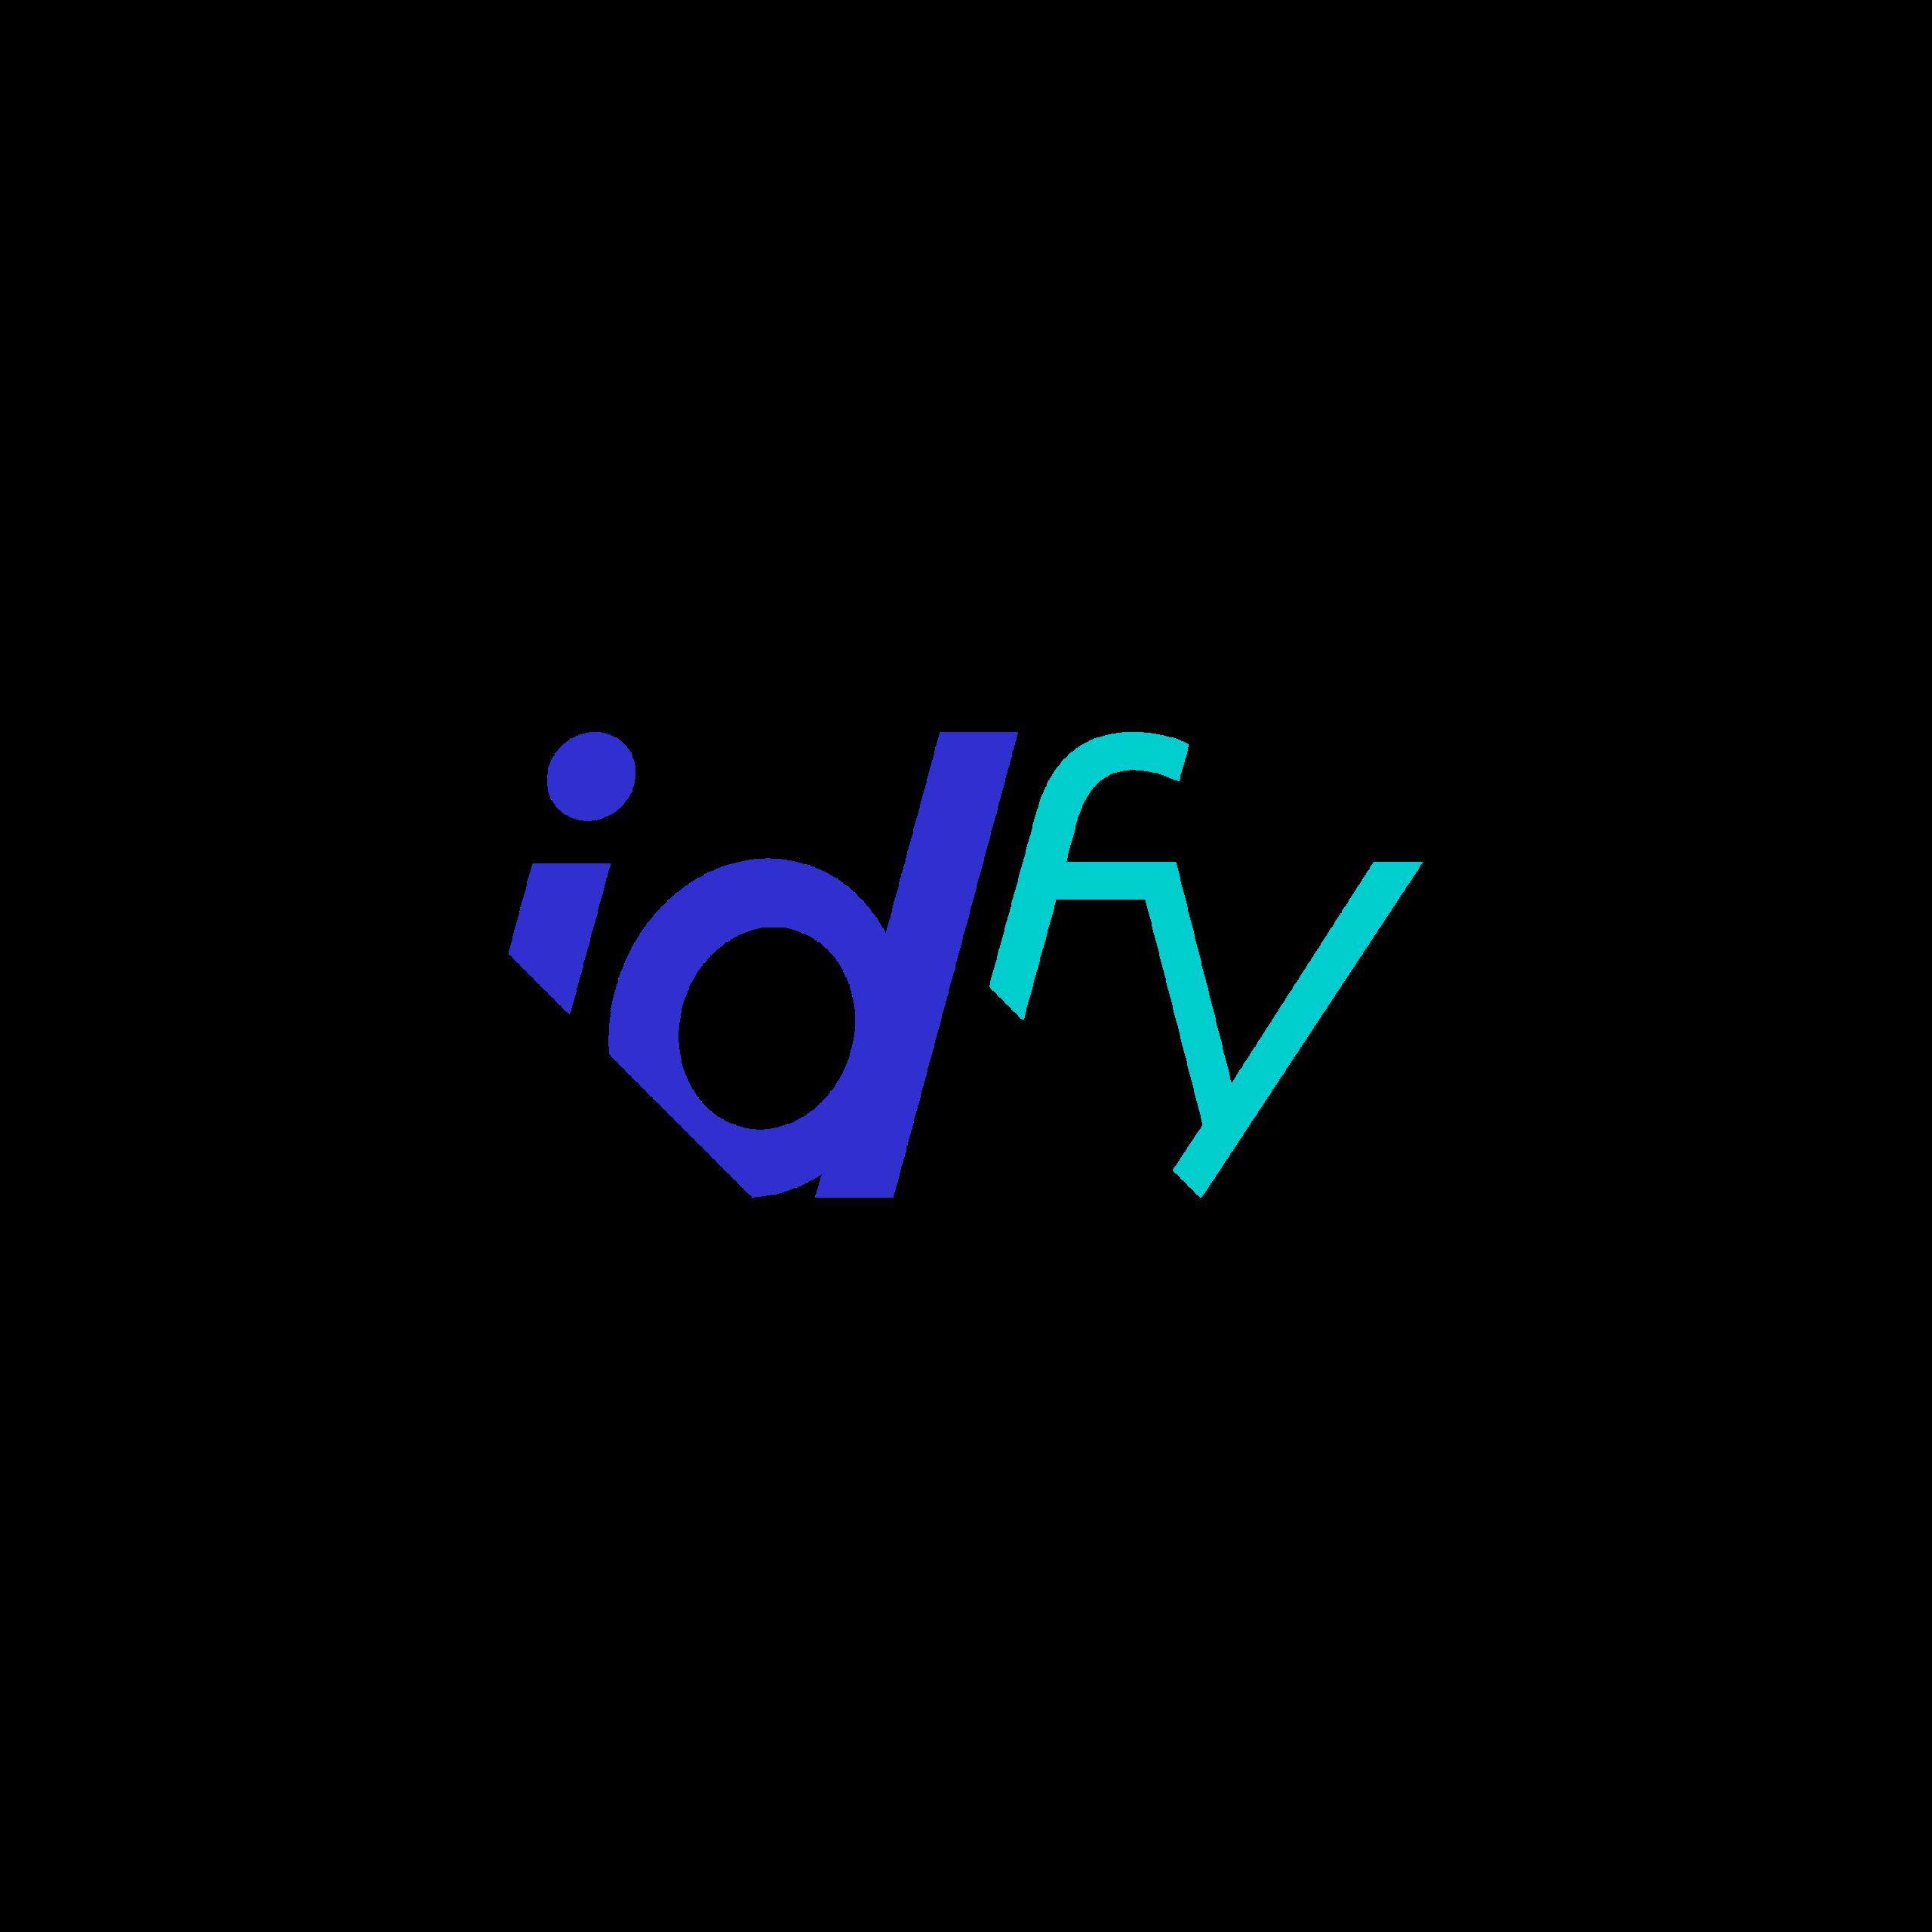 idfy-rgb